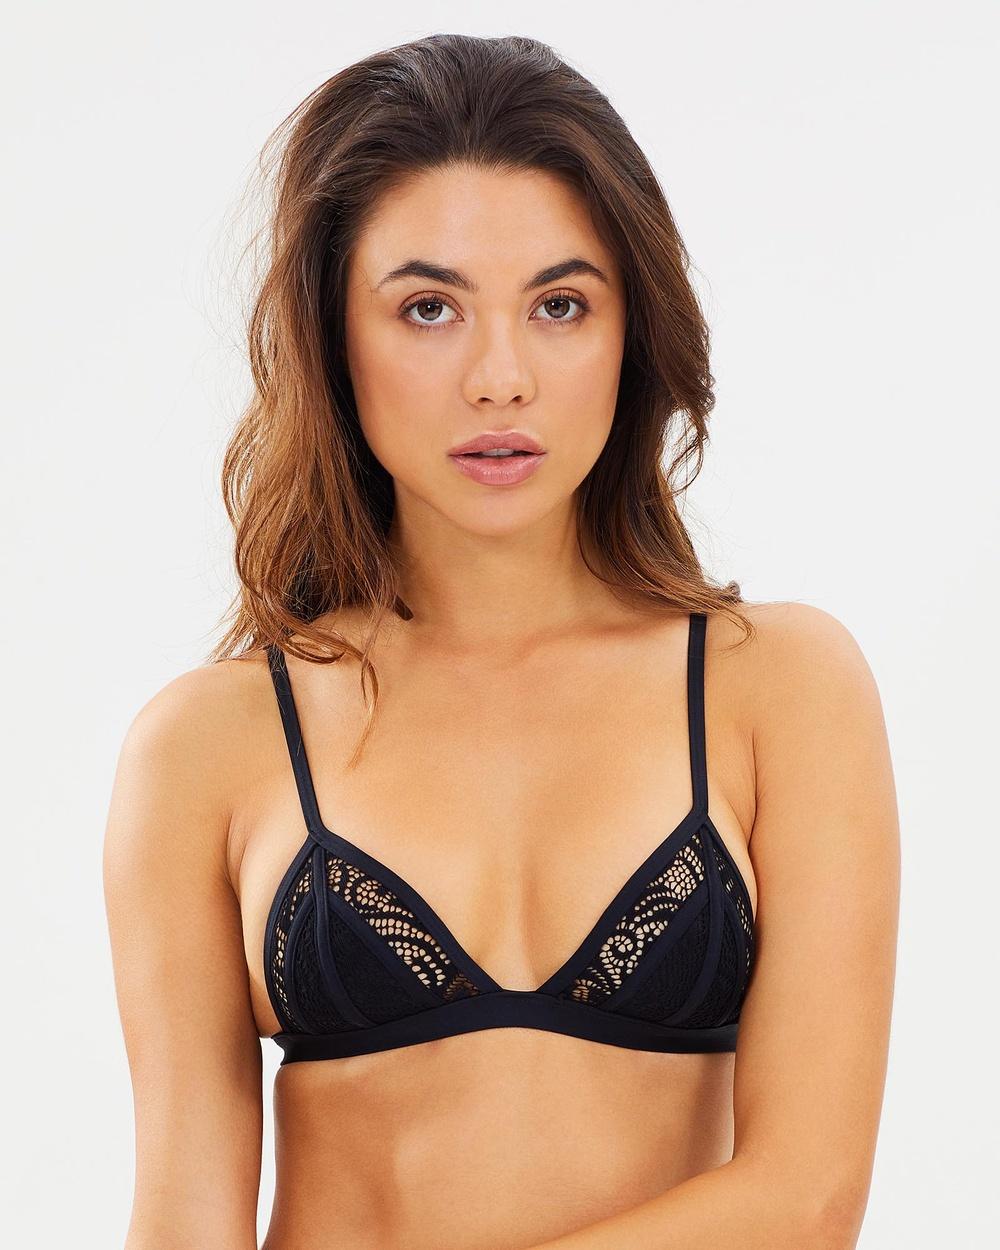 Aqua Blu Australia Luxe Tri Top Bikini Tops Luxe Luxe Tri Top